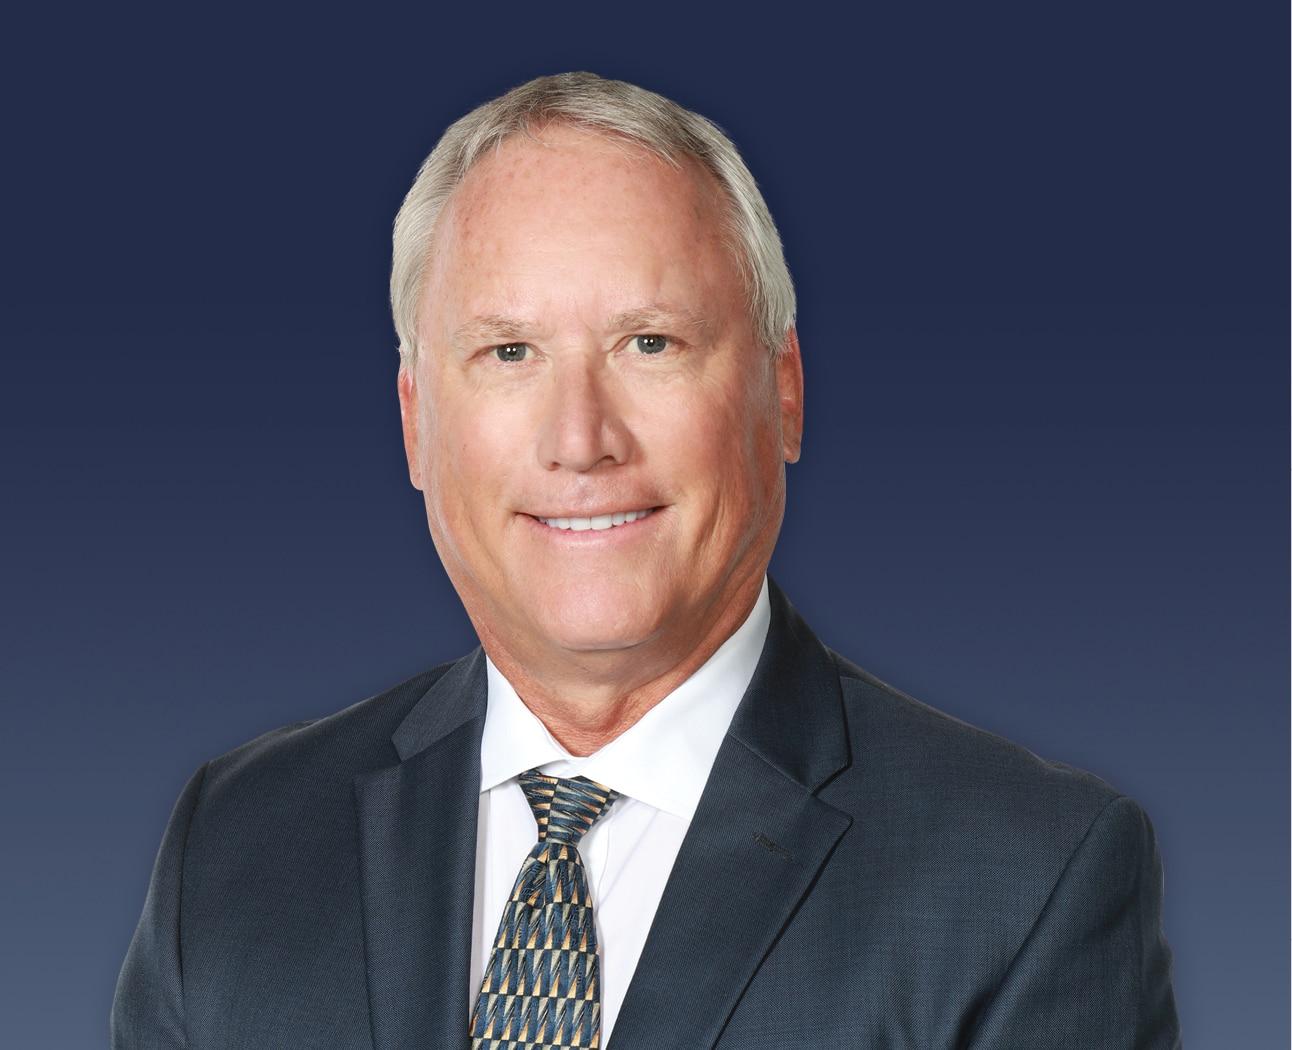 Attorney David Sweat